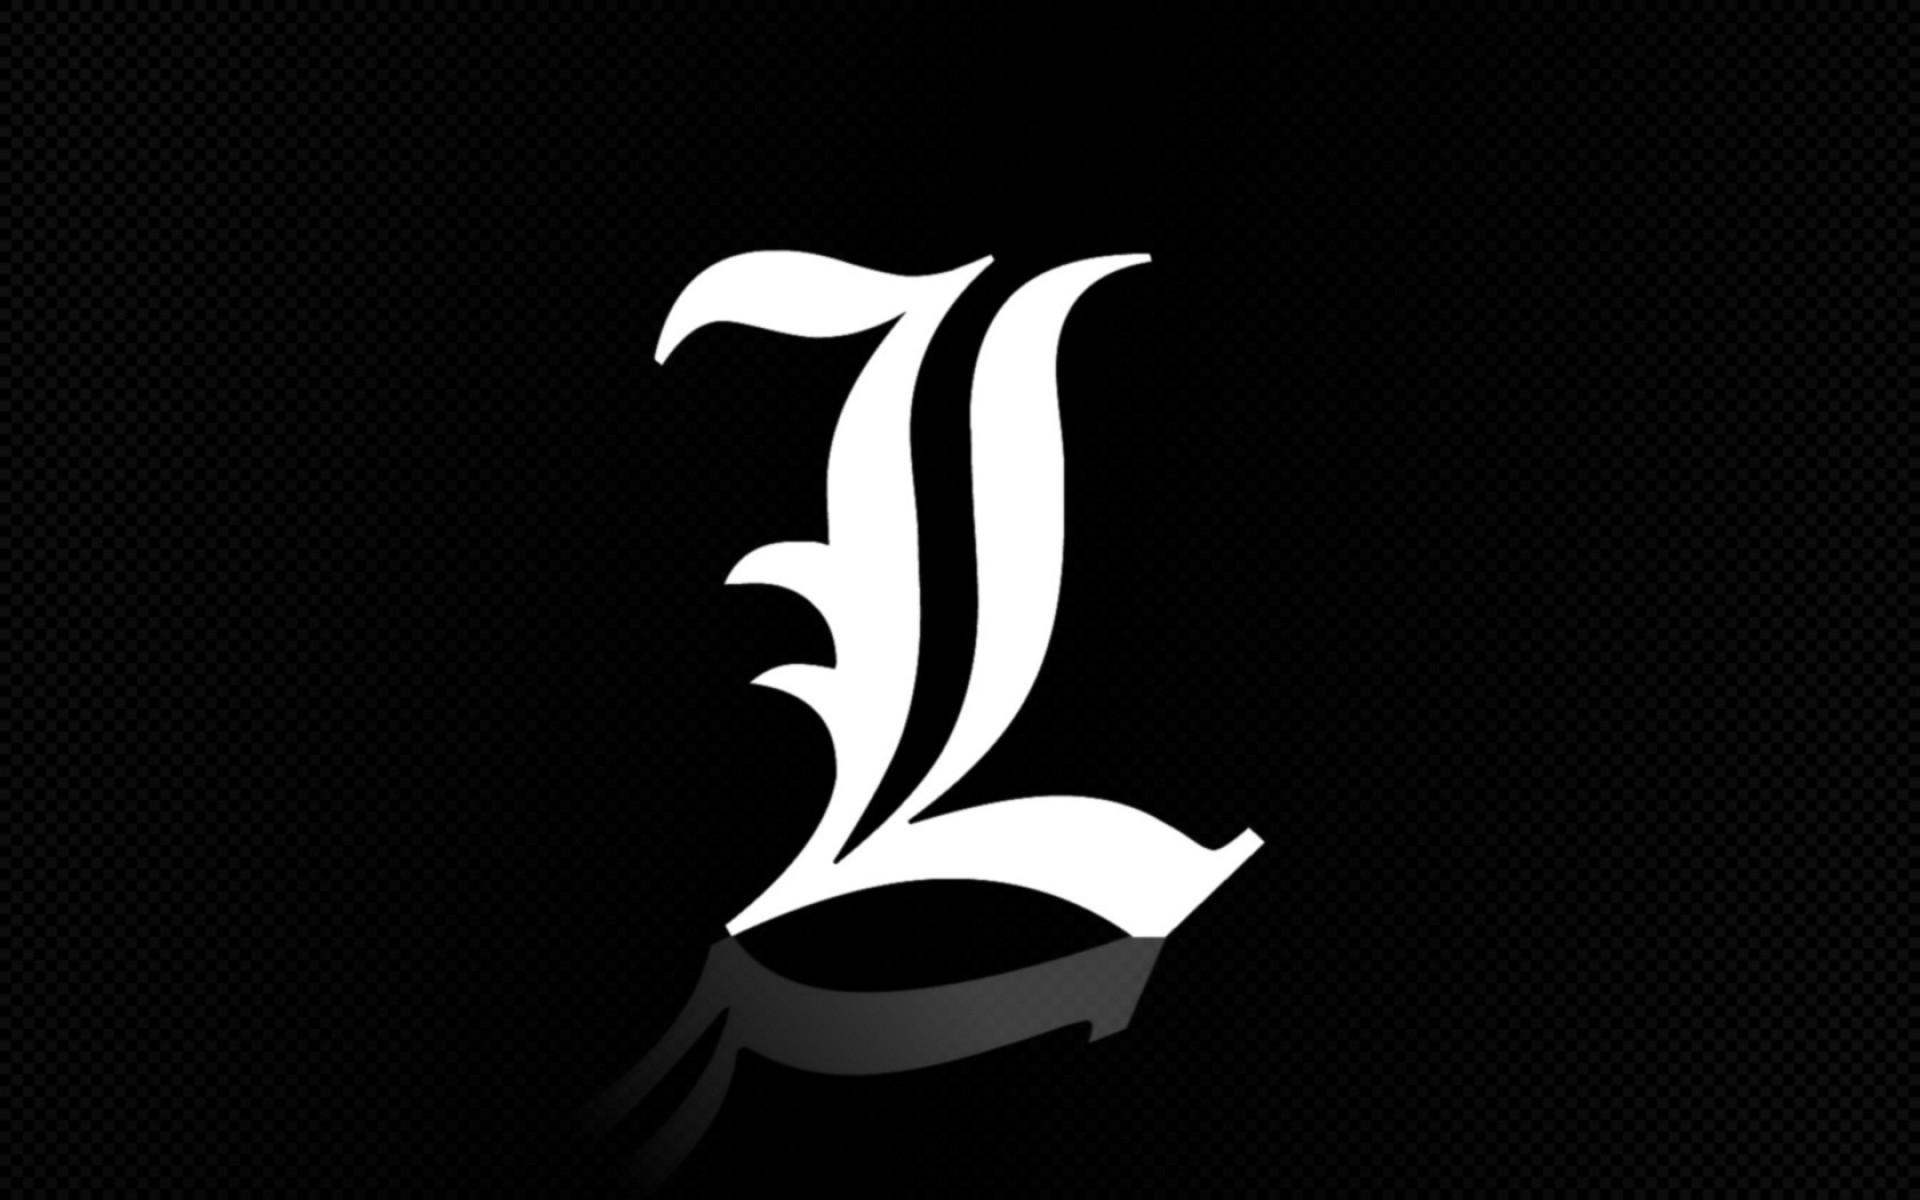 L Anime Logo